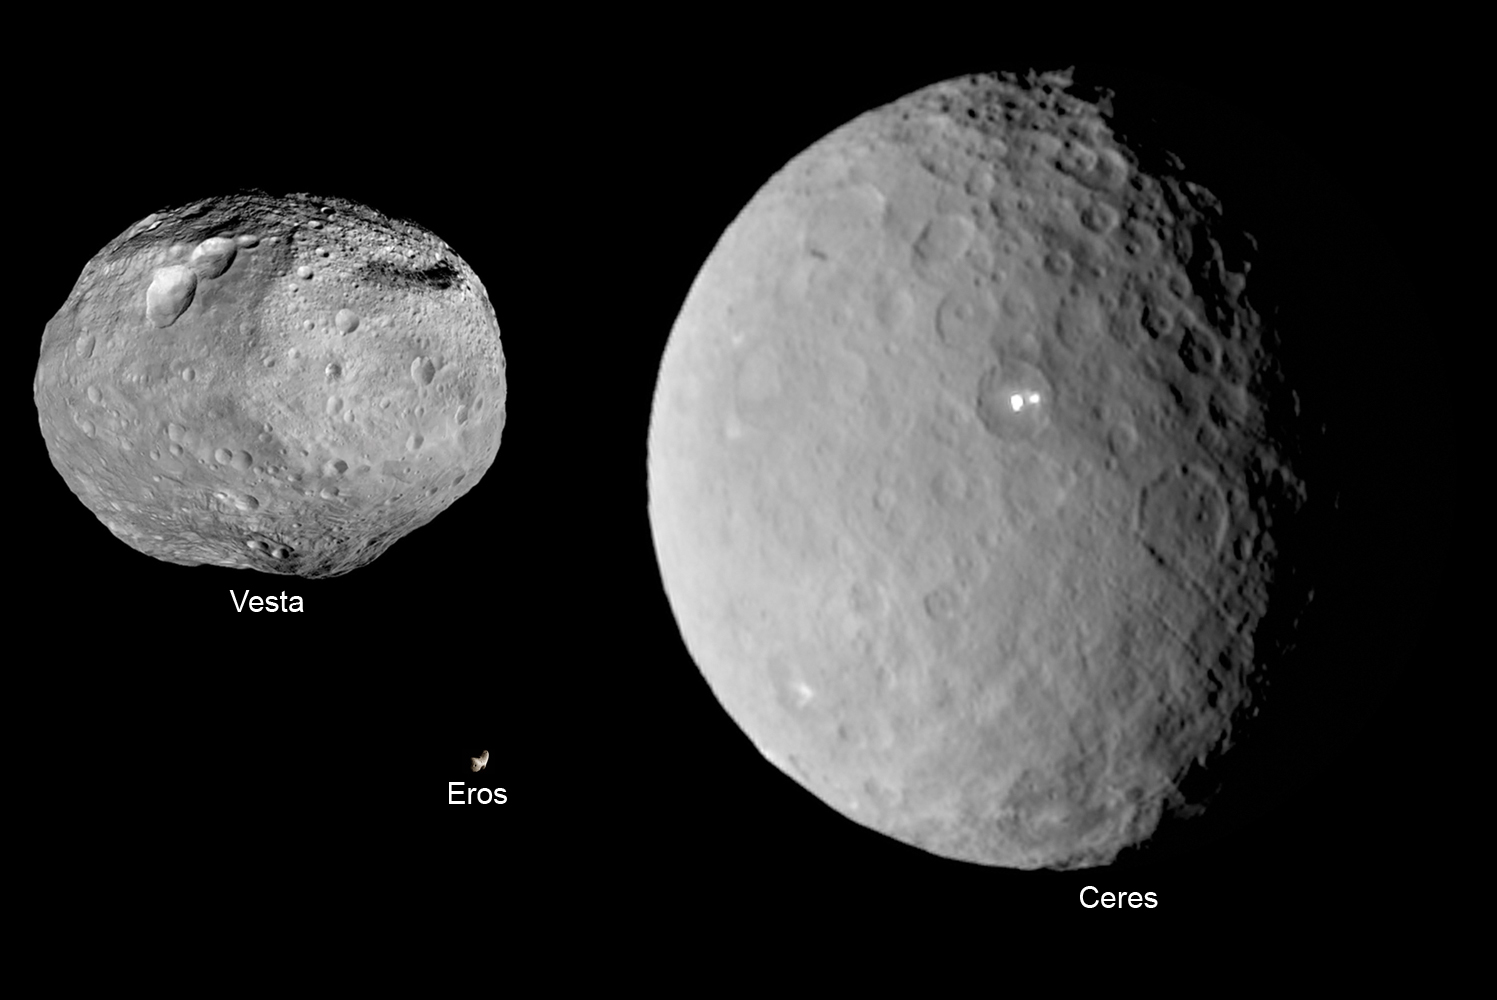 Asteroids Vesta, Eros and Ceres